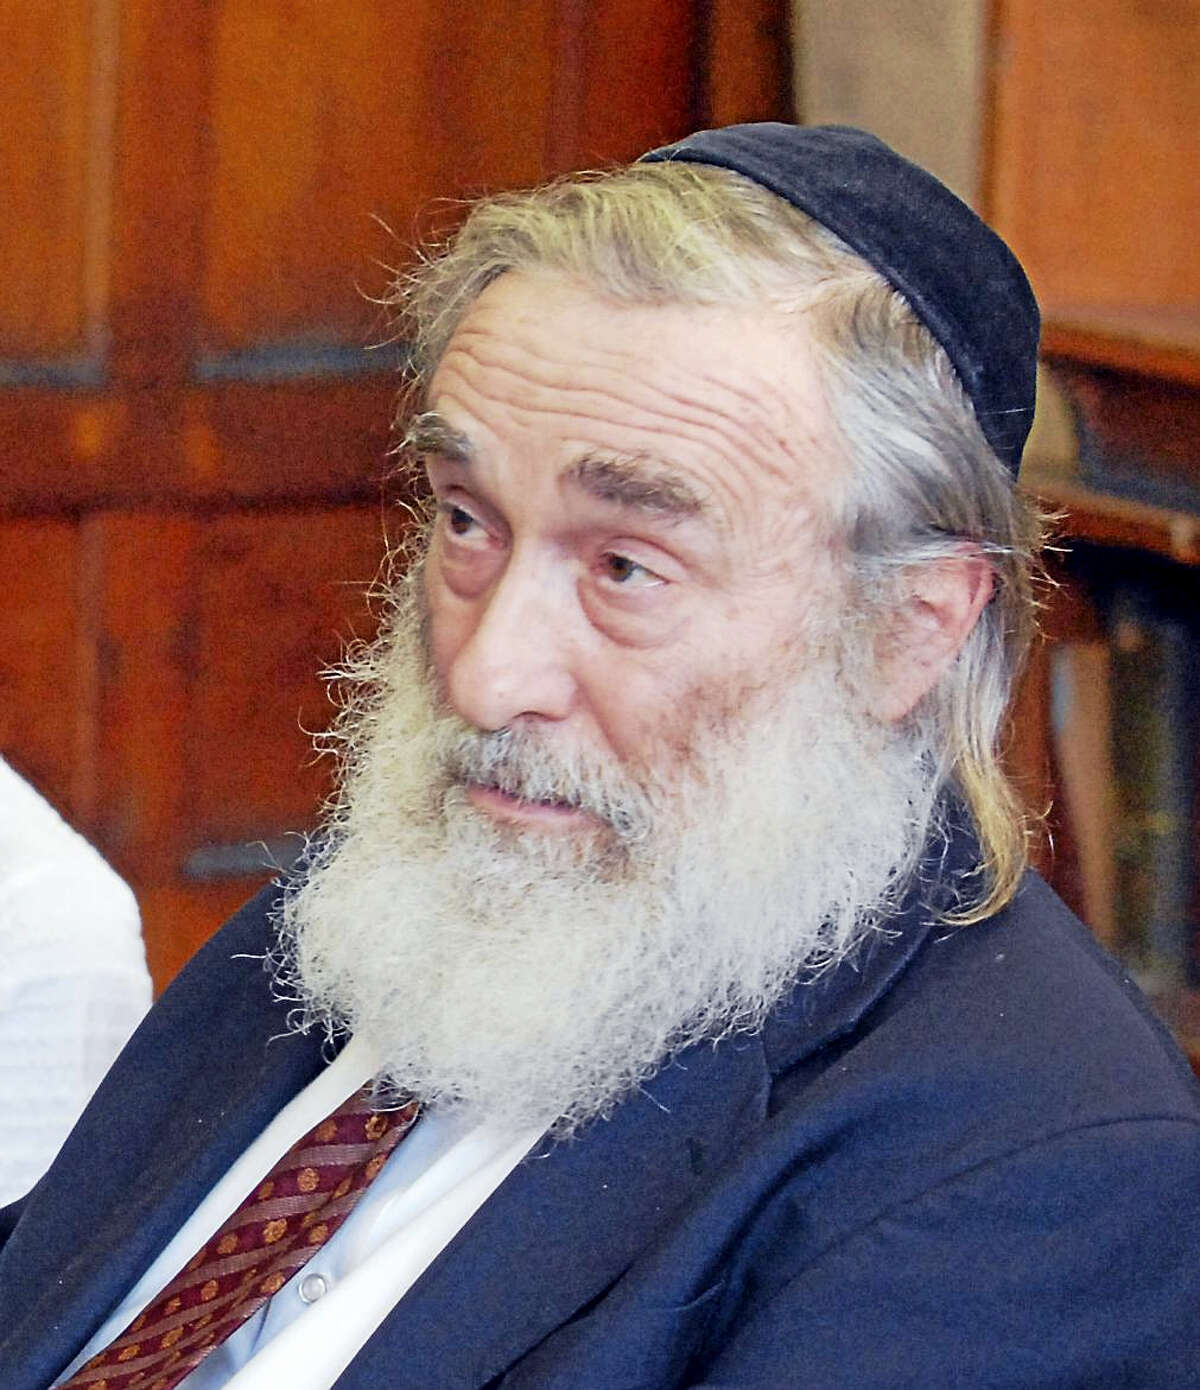 At the Yeshiva of New Haven: Rabbi Daniel Greer (File photo)